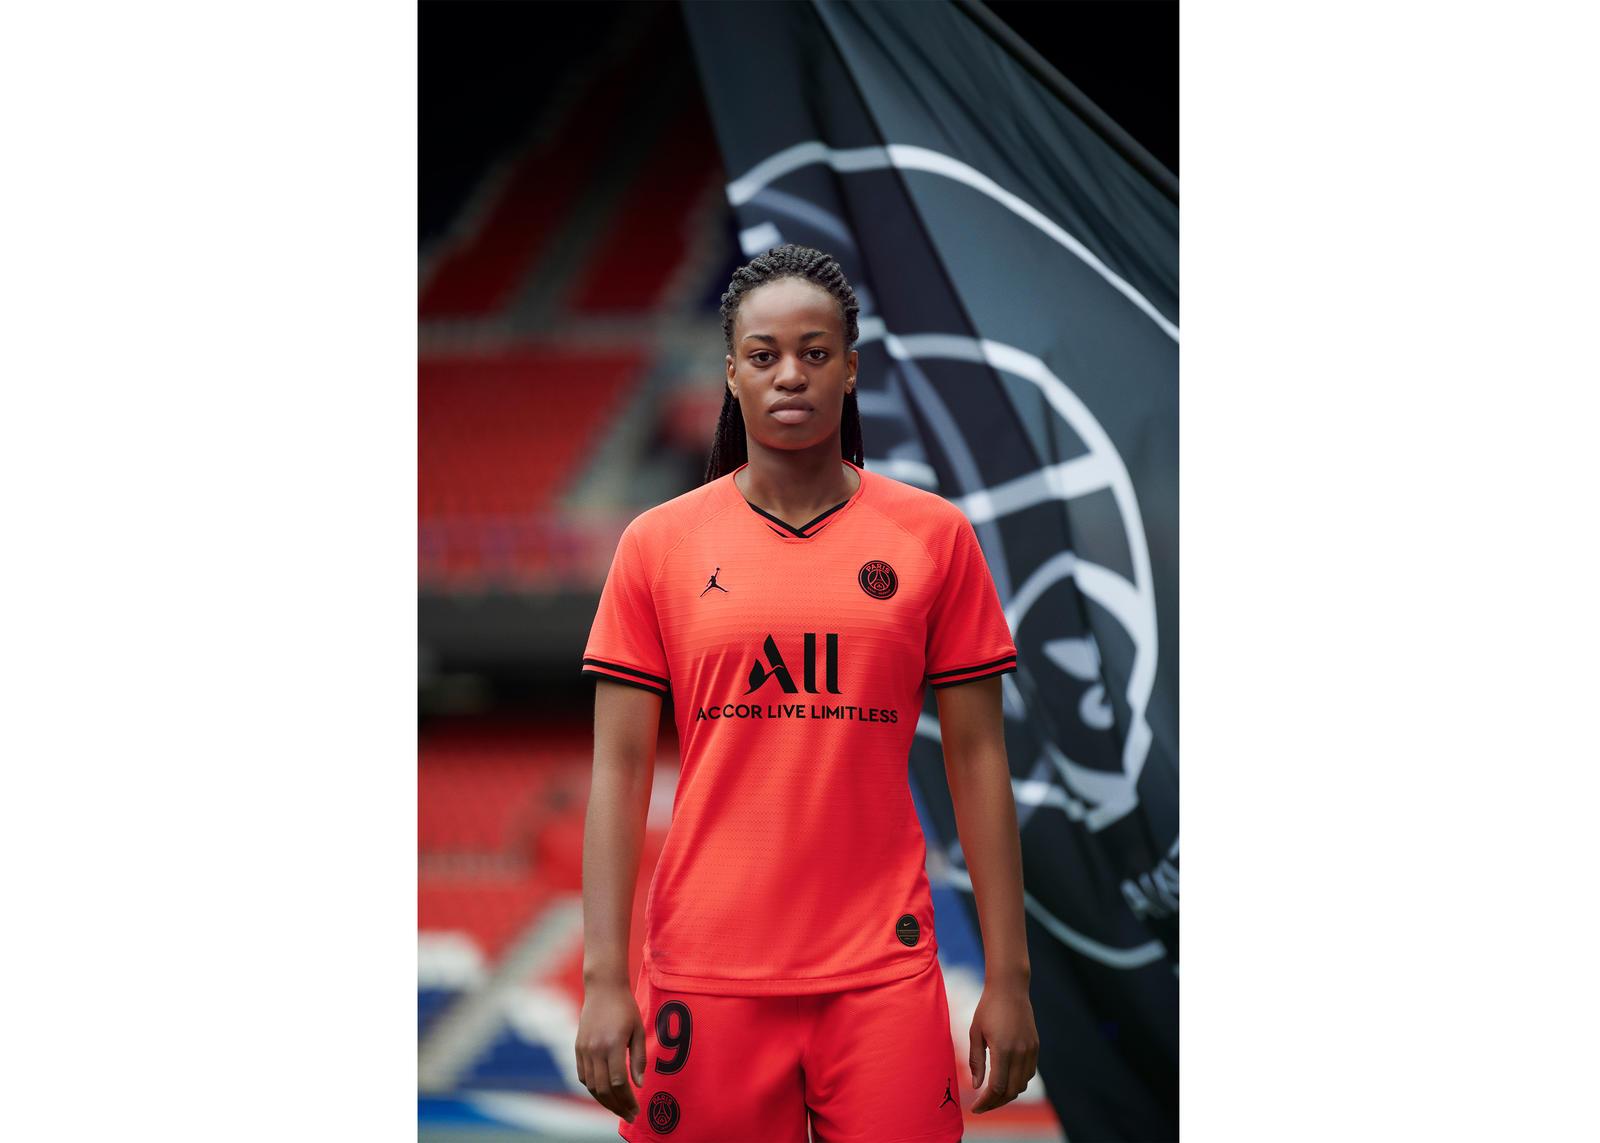 paris saint germain away kit 2019 20